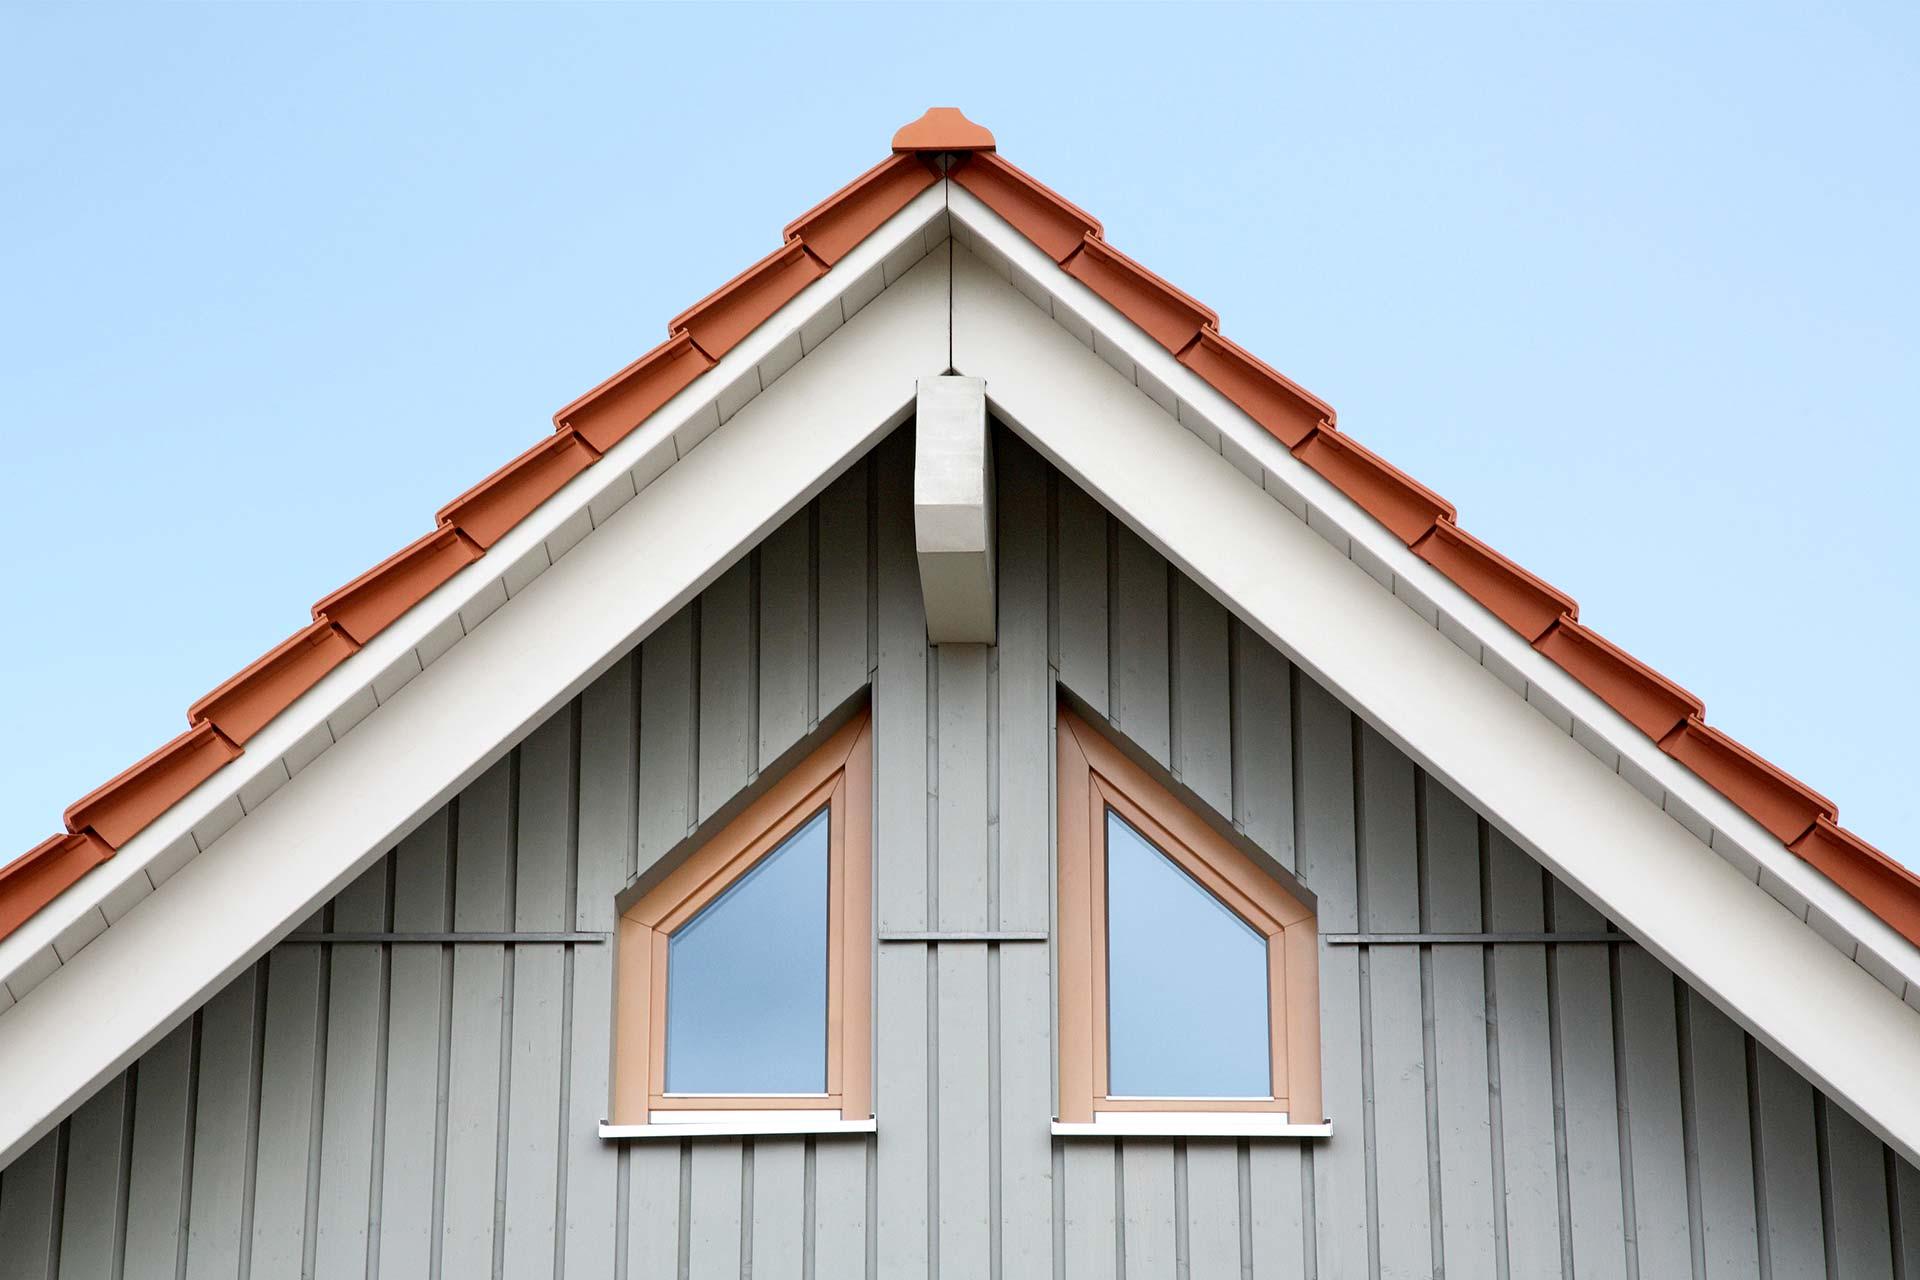 Holzhaus in Bayern